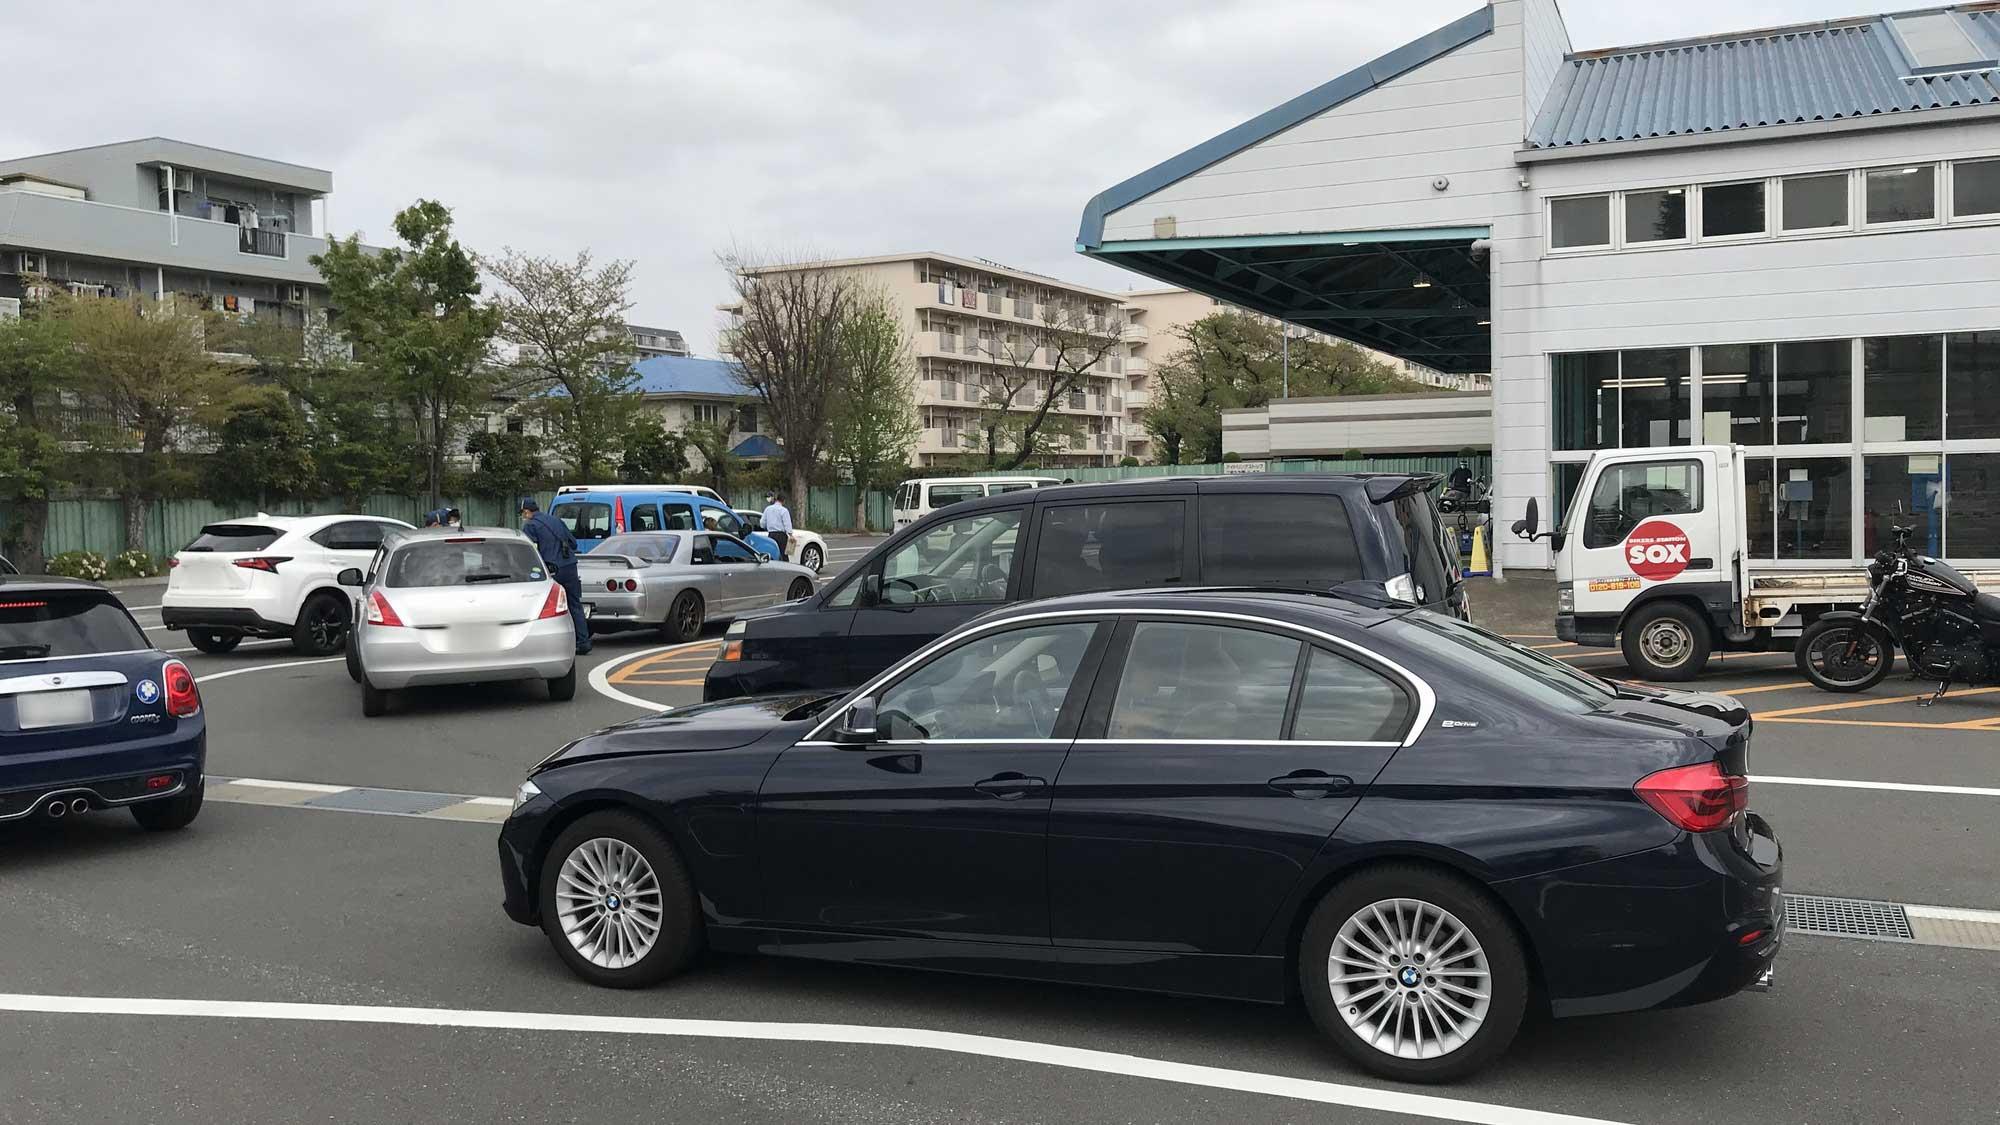 EVやPHEVはユーザー車検がお得で簡単〜『BMW 330e』実録レポート【国沢光宏】   EVsmartブログ